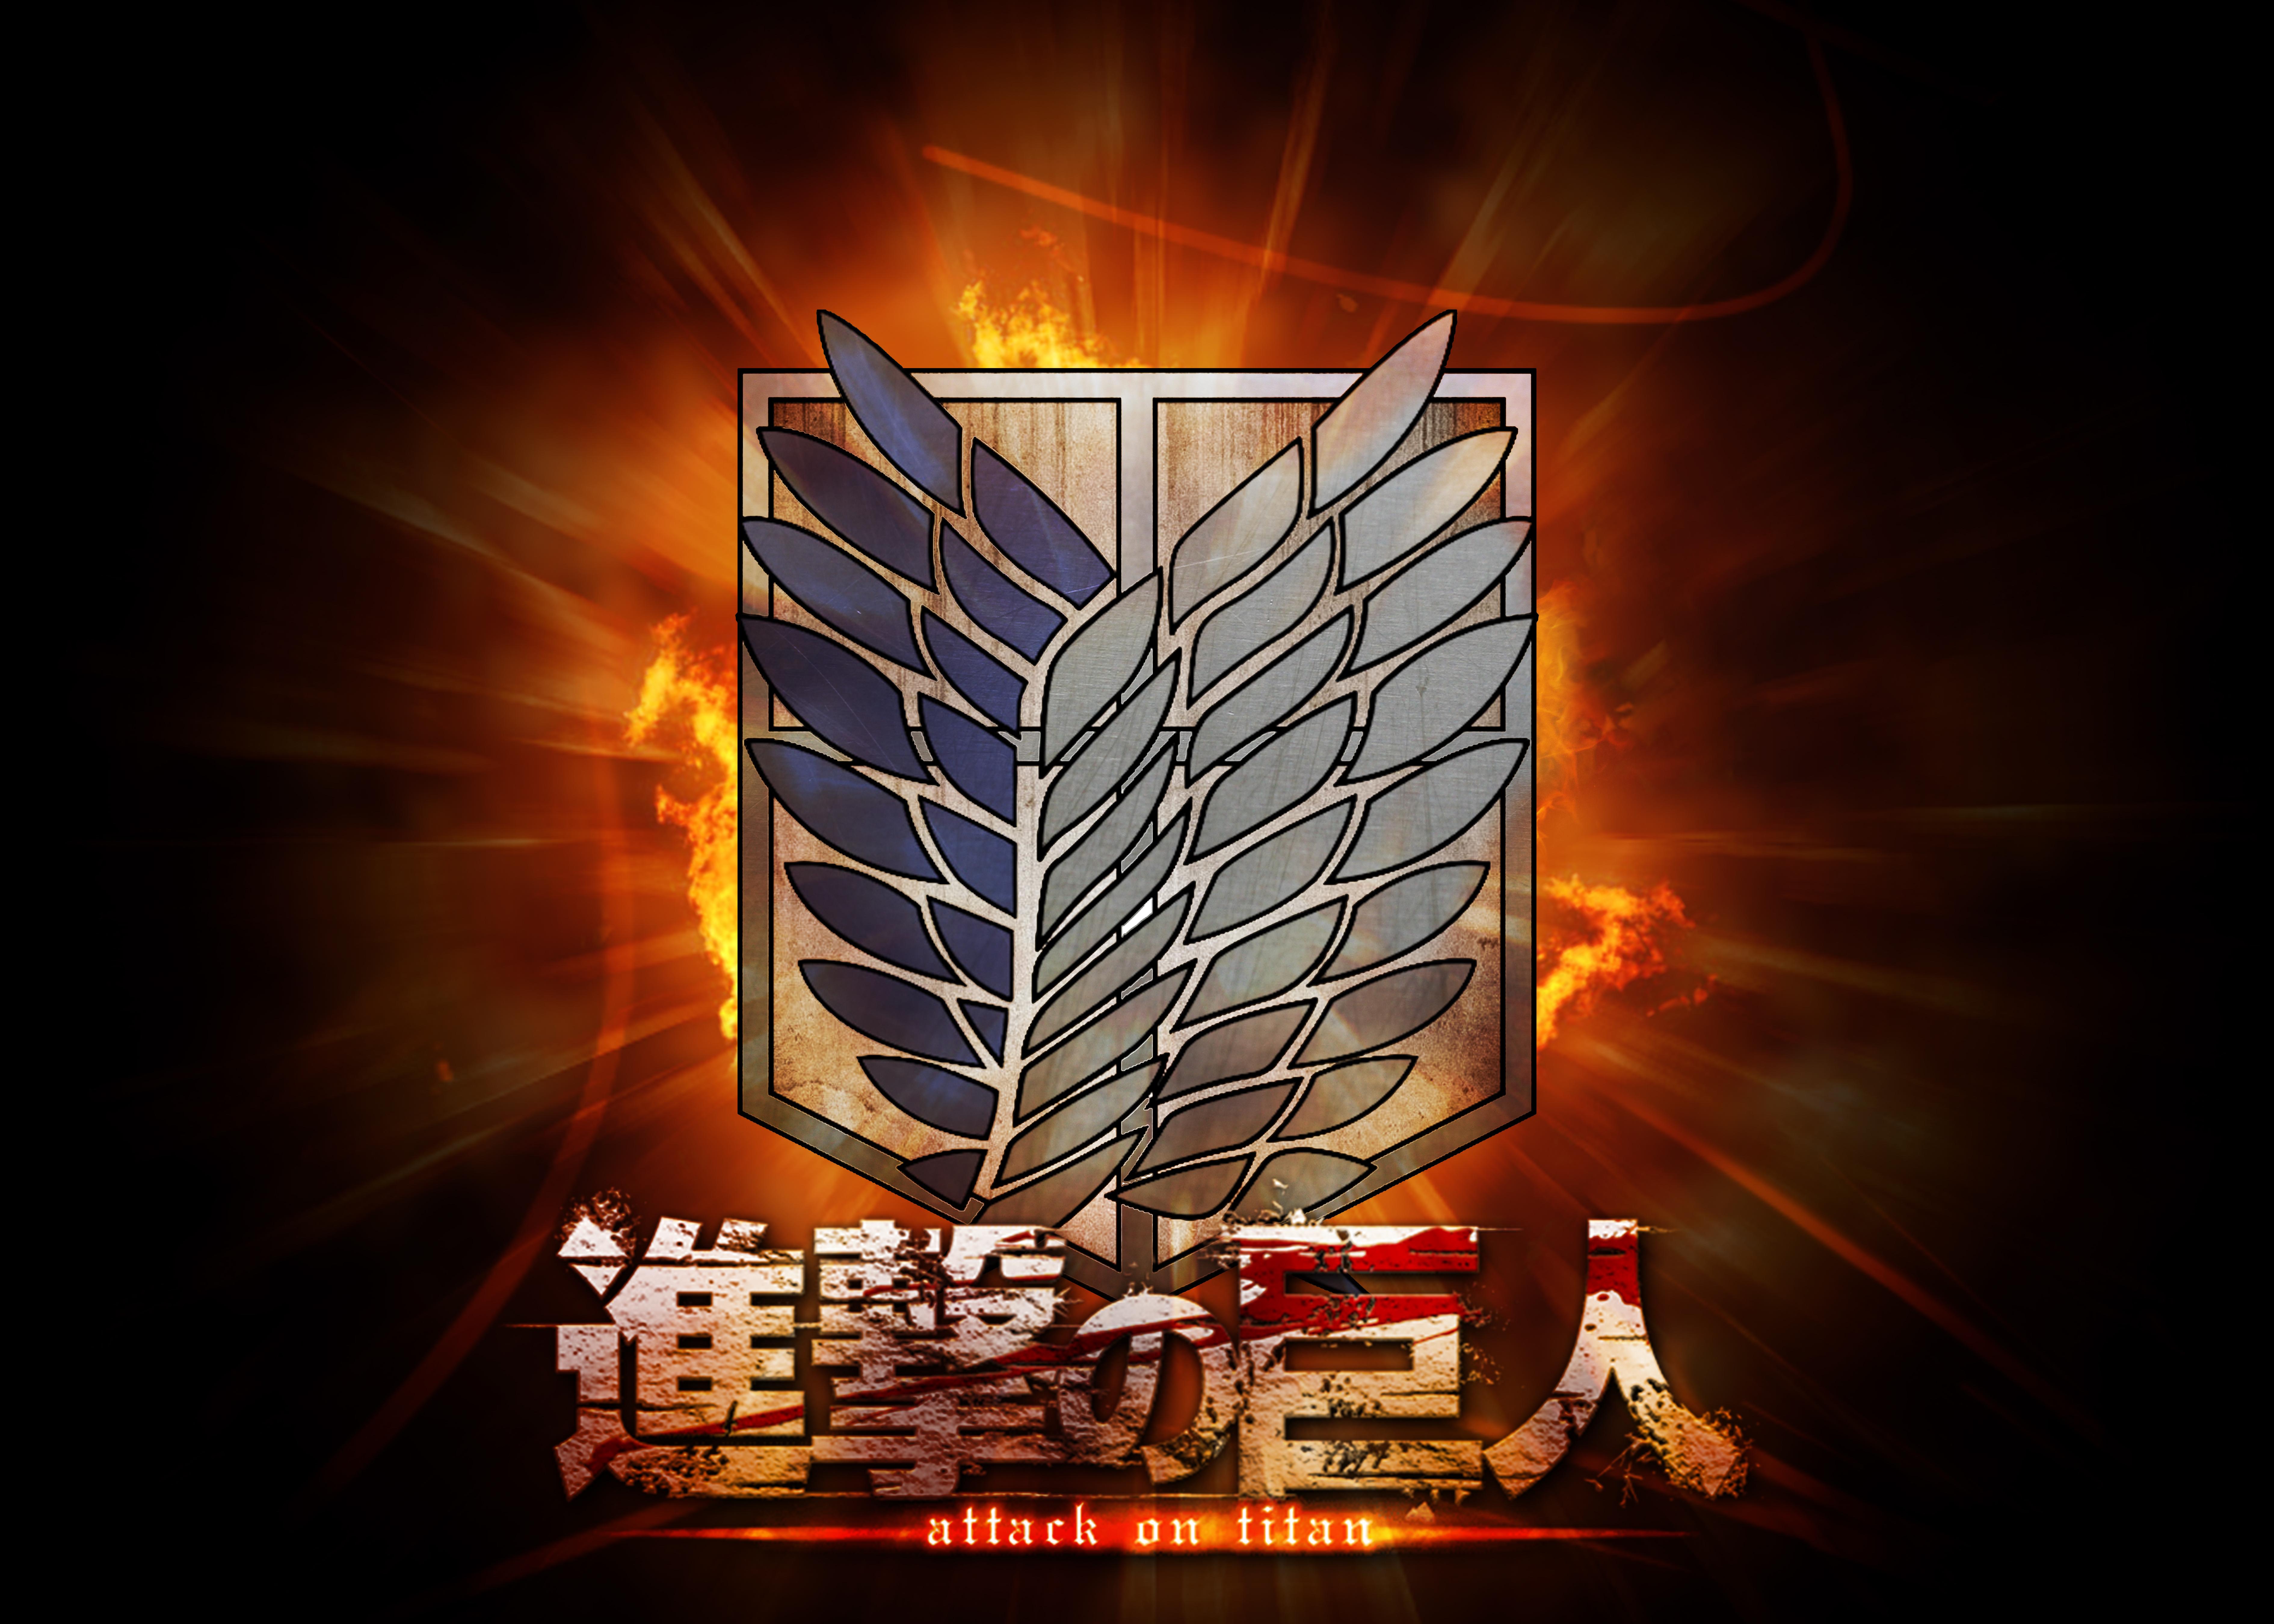 Attack On Titan Wallpaper By Dirtpoorriceking On Deviantart